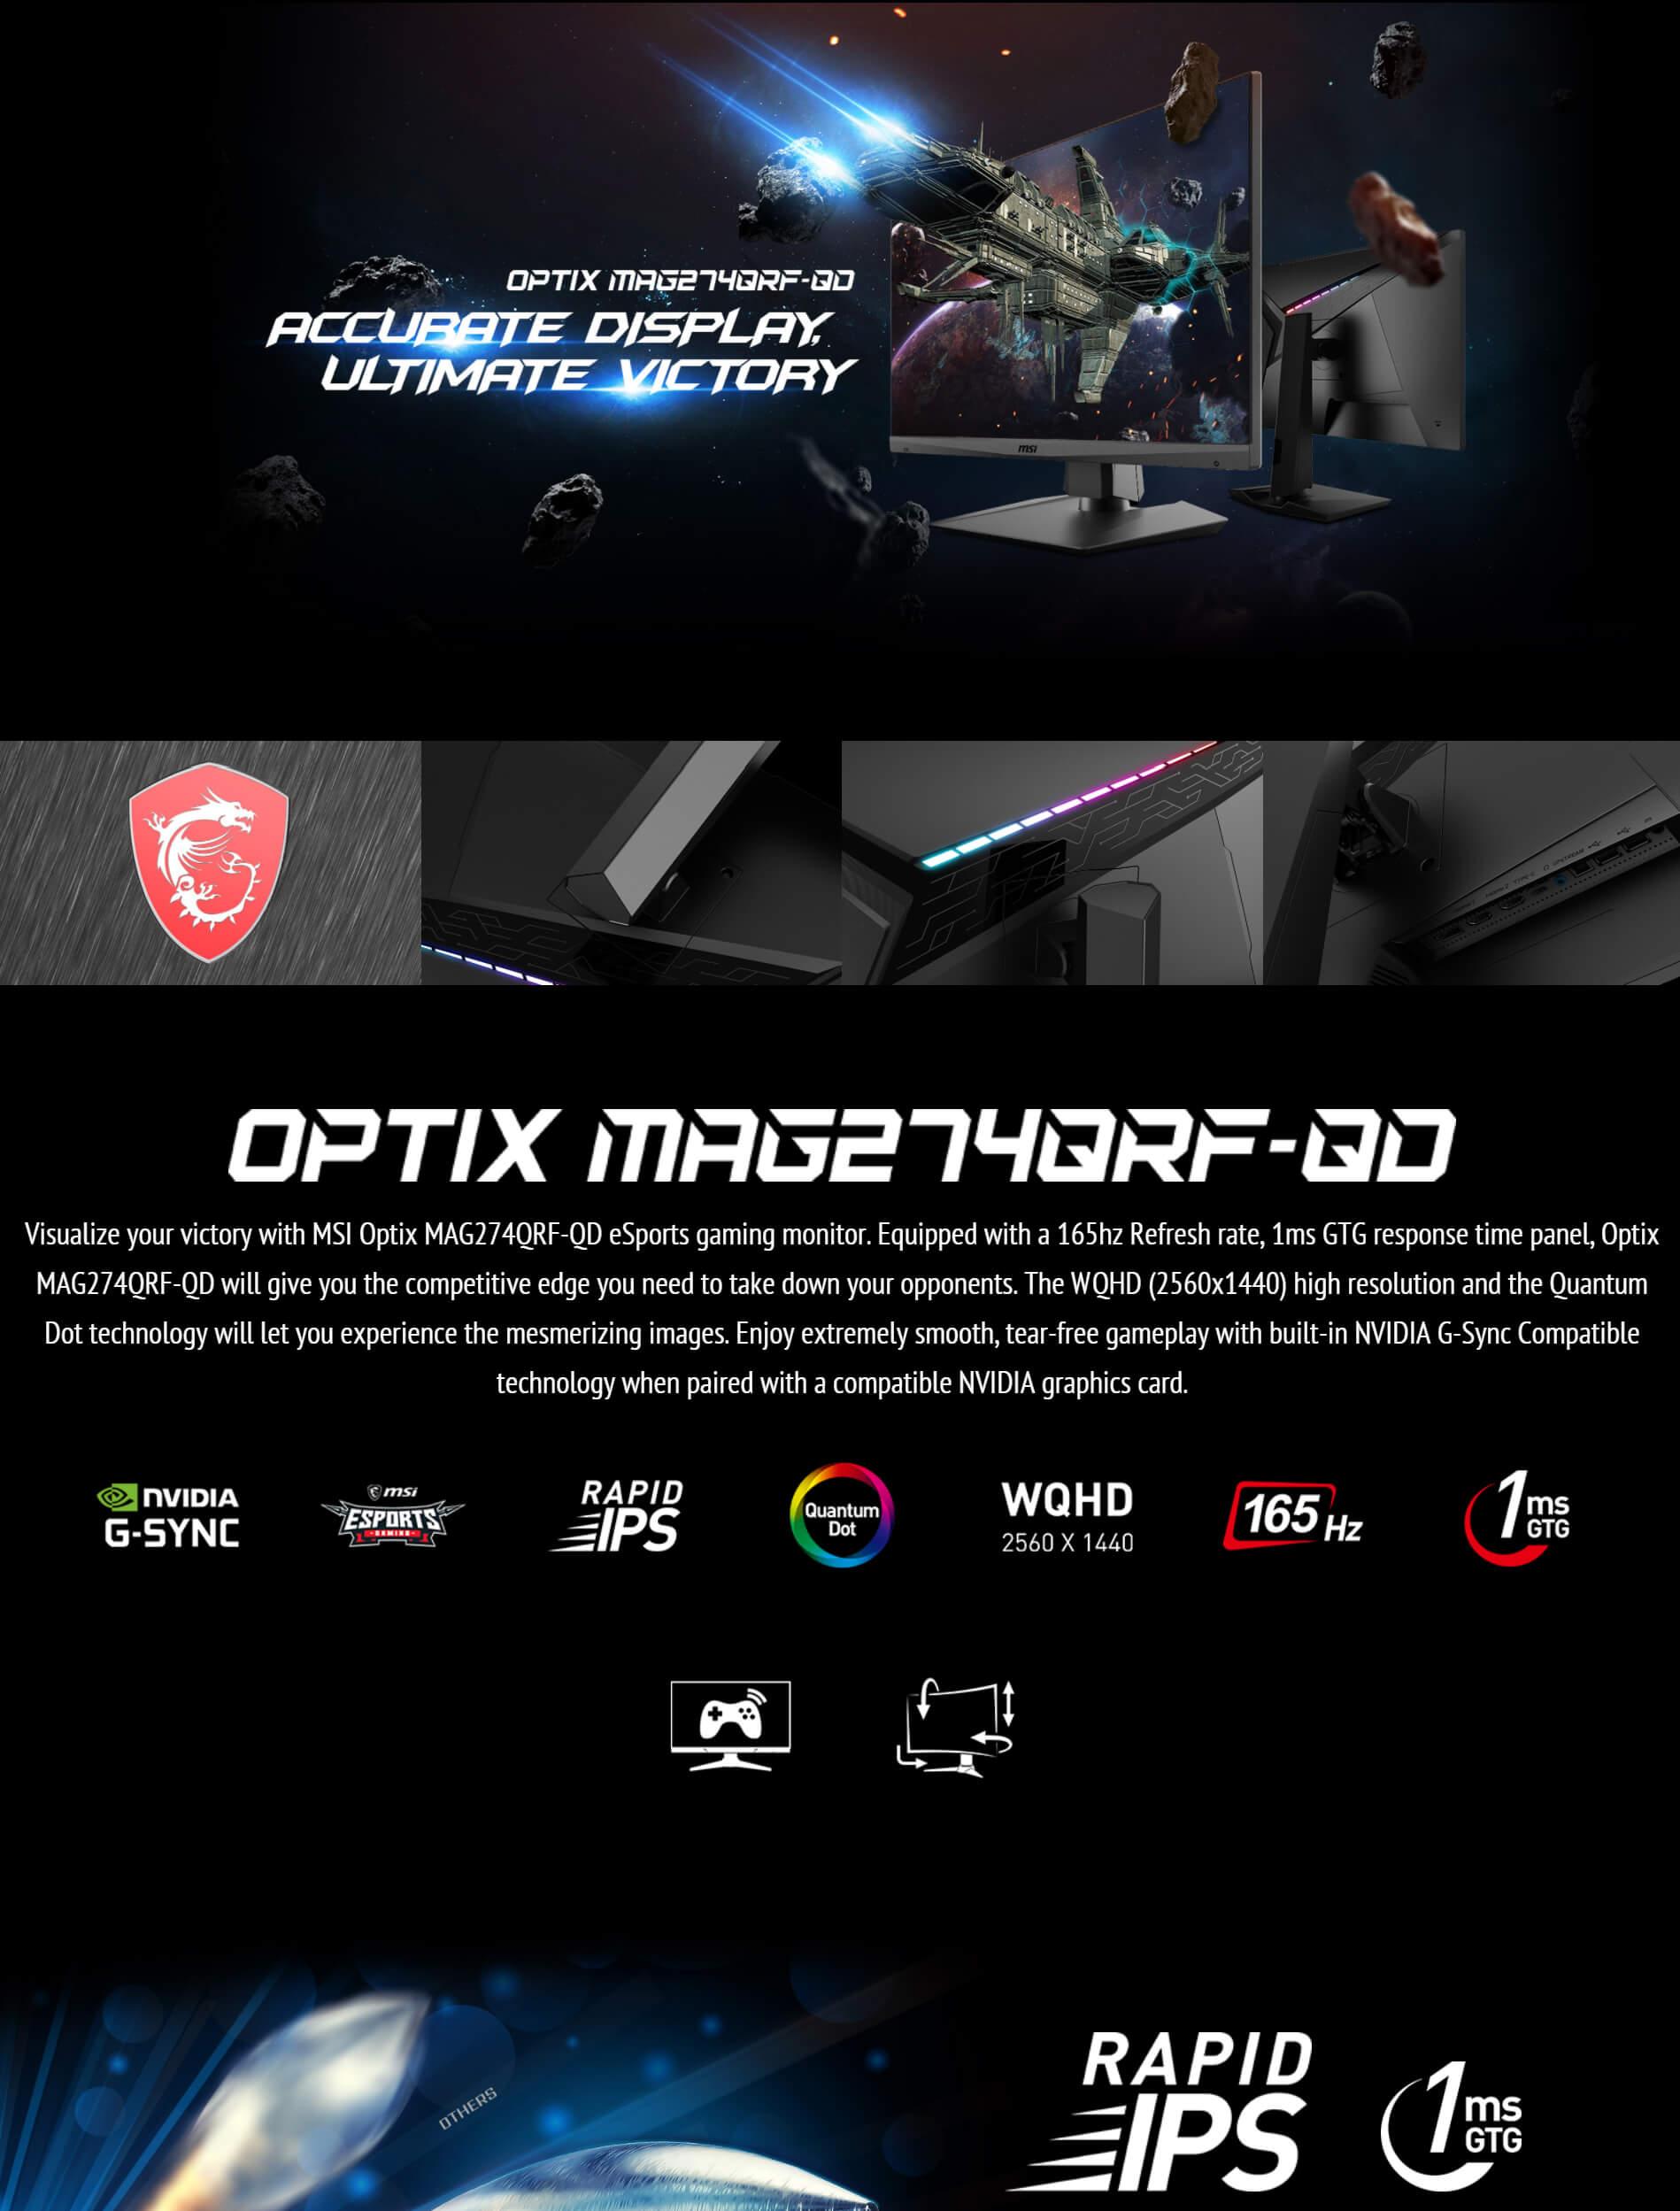 Buy Online - MSI Optix MAG274QRF-QD | 2K 165Hz Gaming Monitor